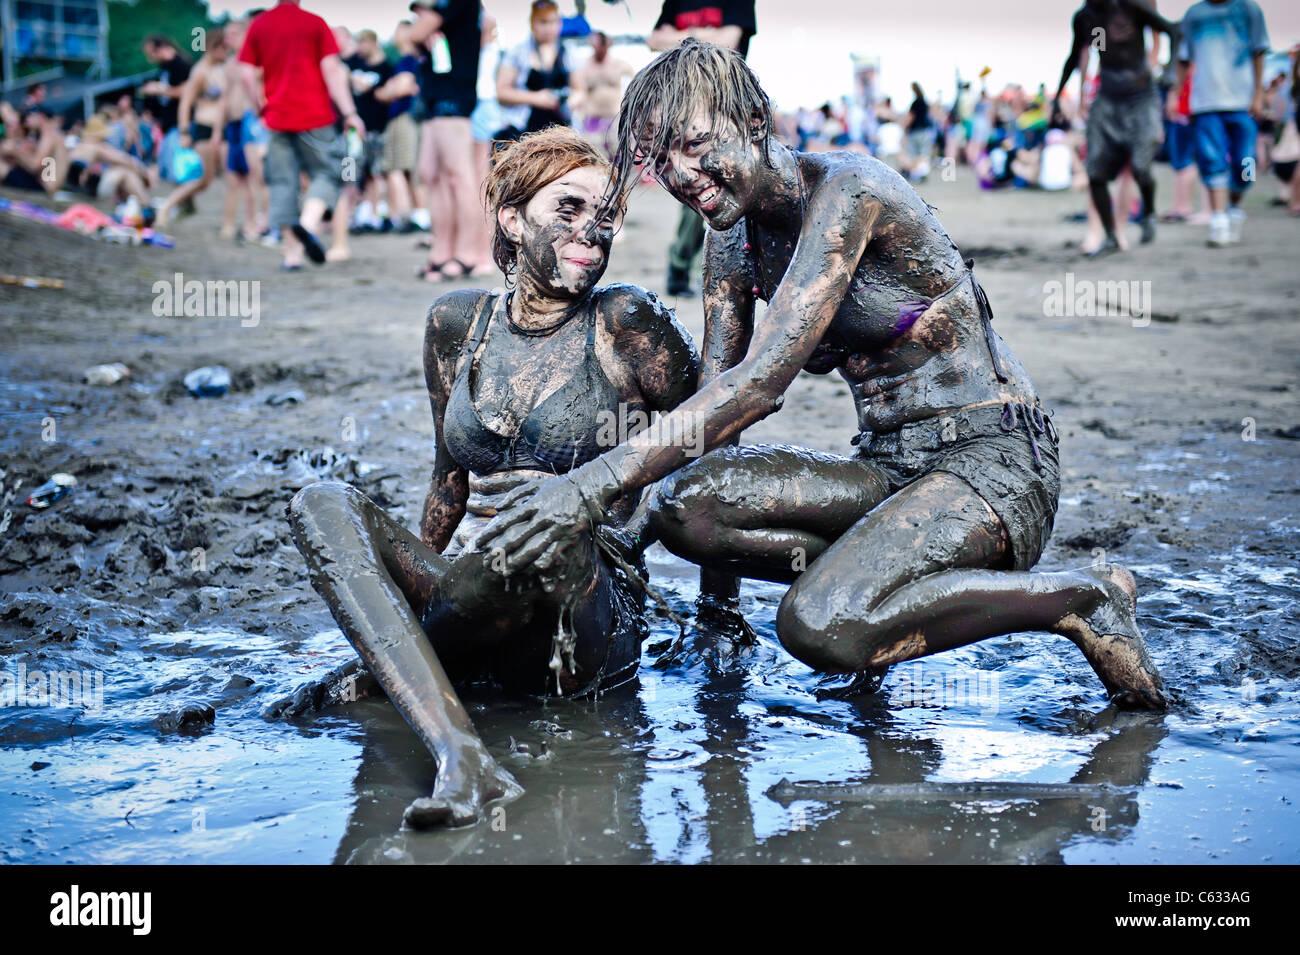 Young women having fun in the mud at the Przystanek Woodstock - Europe's largest open air festival in Kostrzyn, - Stock Image